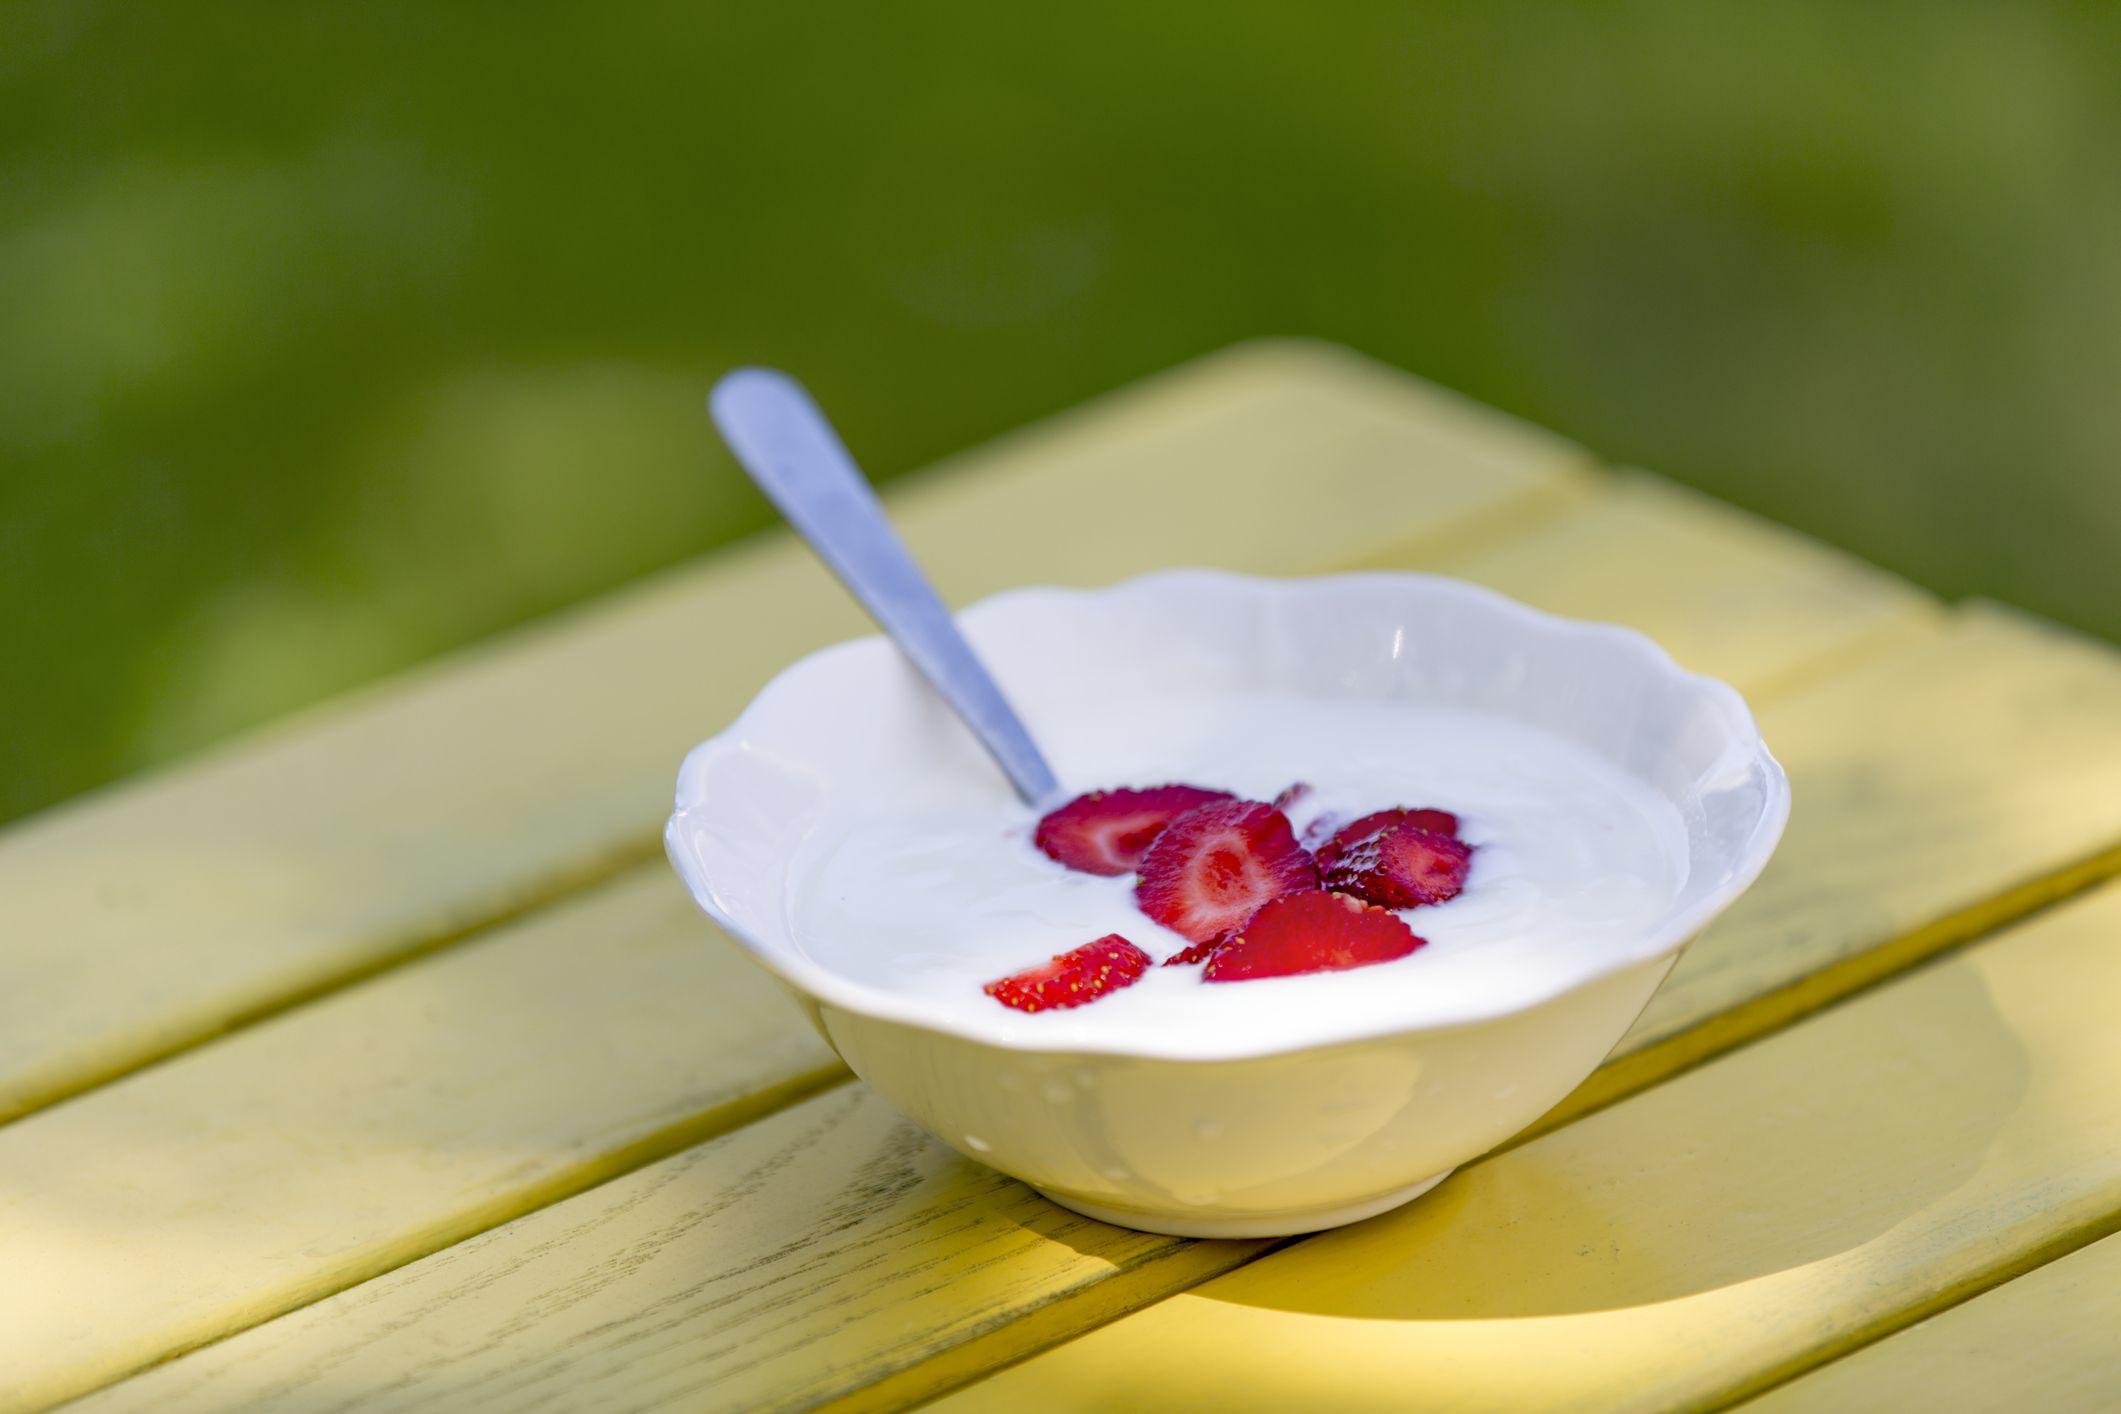 Bowl of yogurt with sliced strawberries